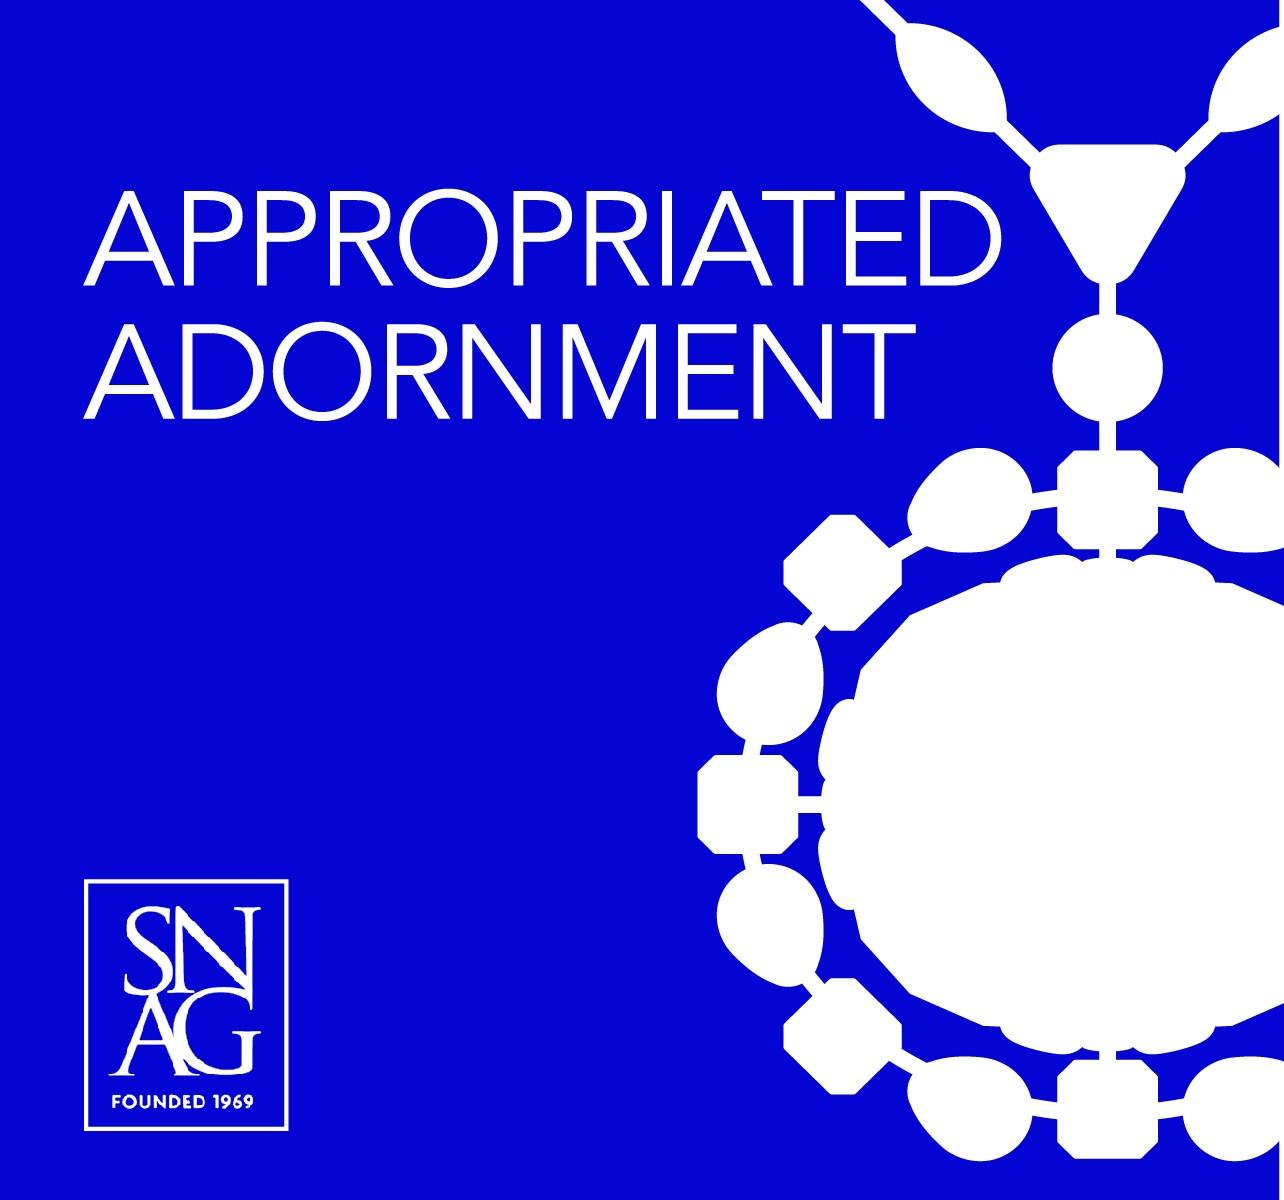 Appropriated Adornment Logo